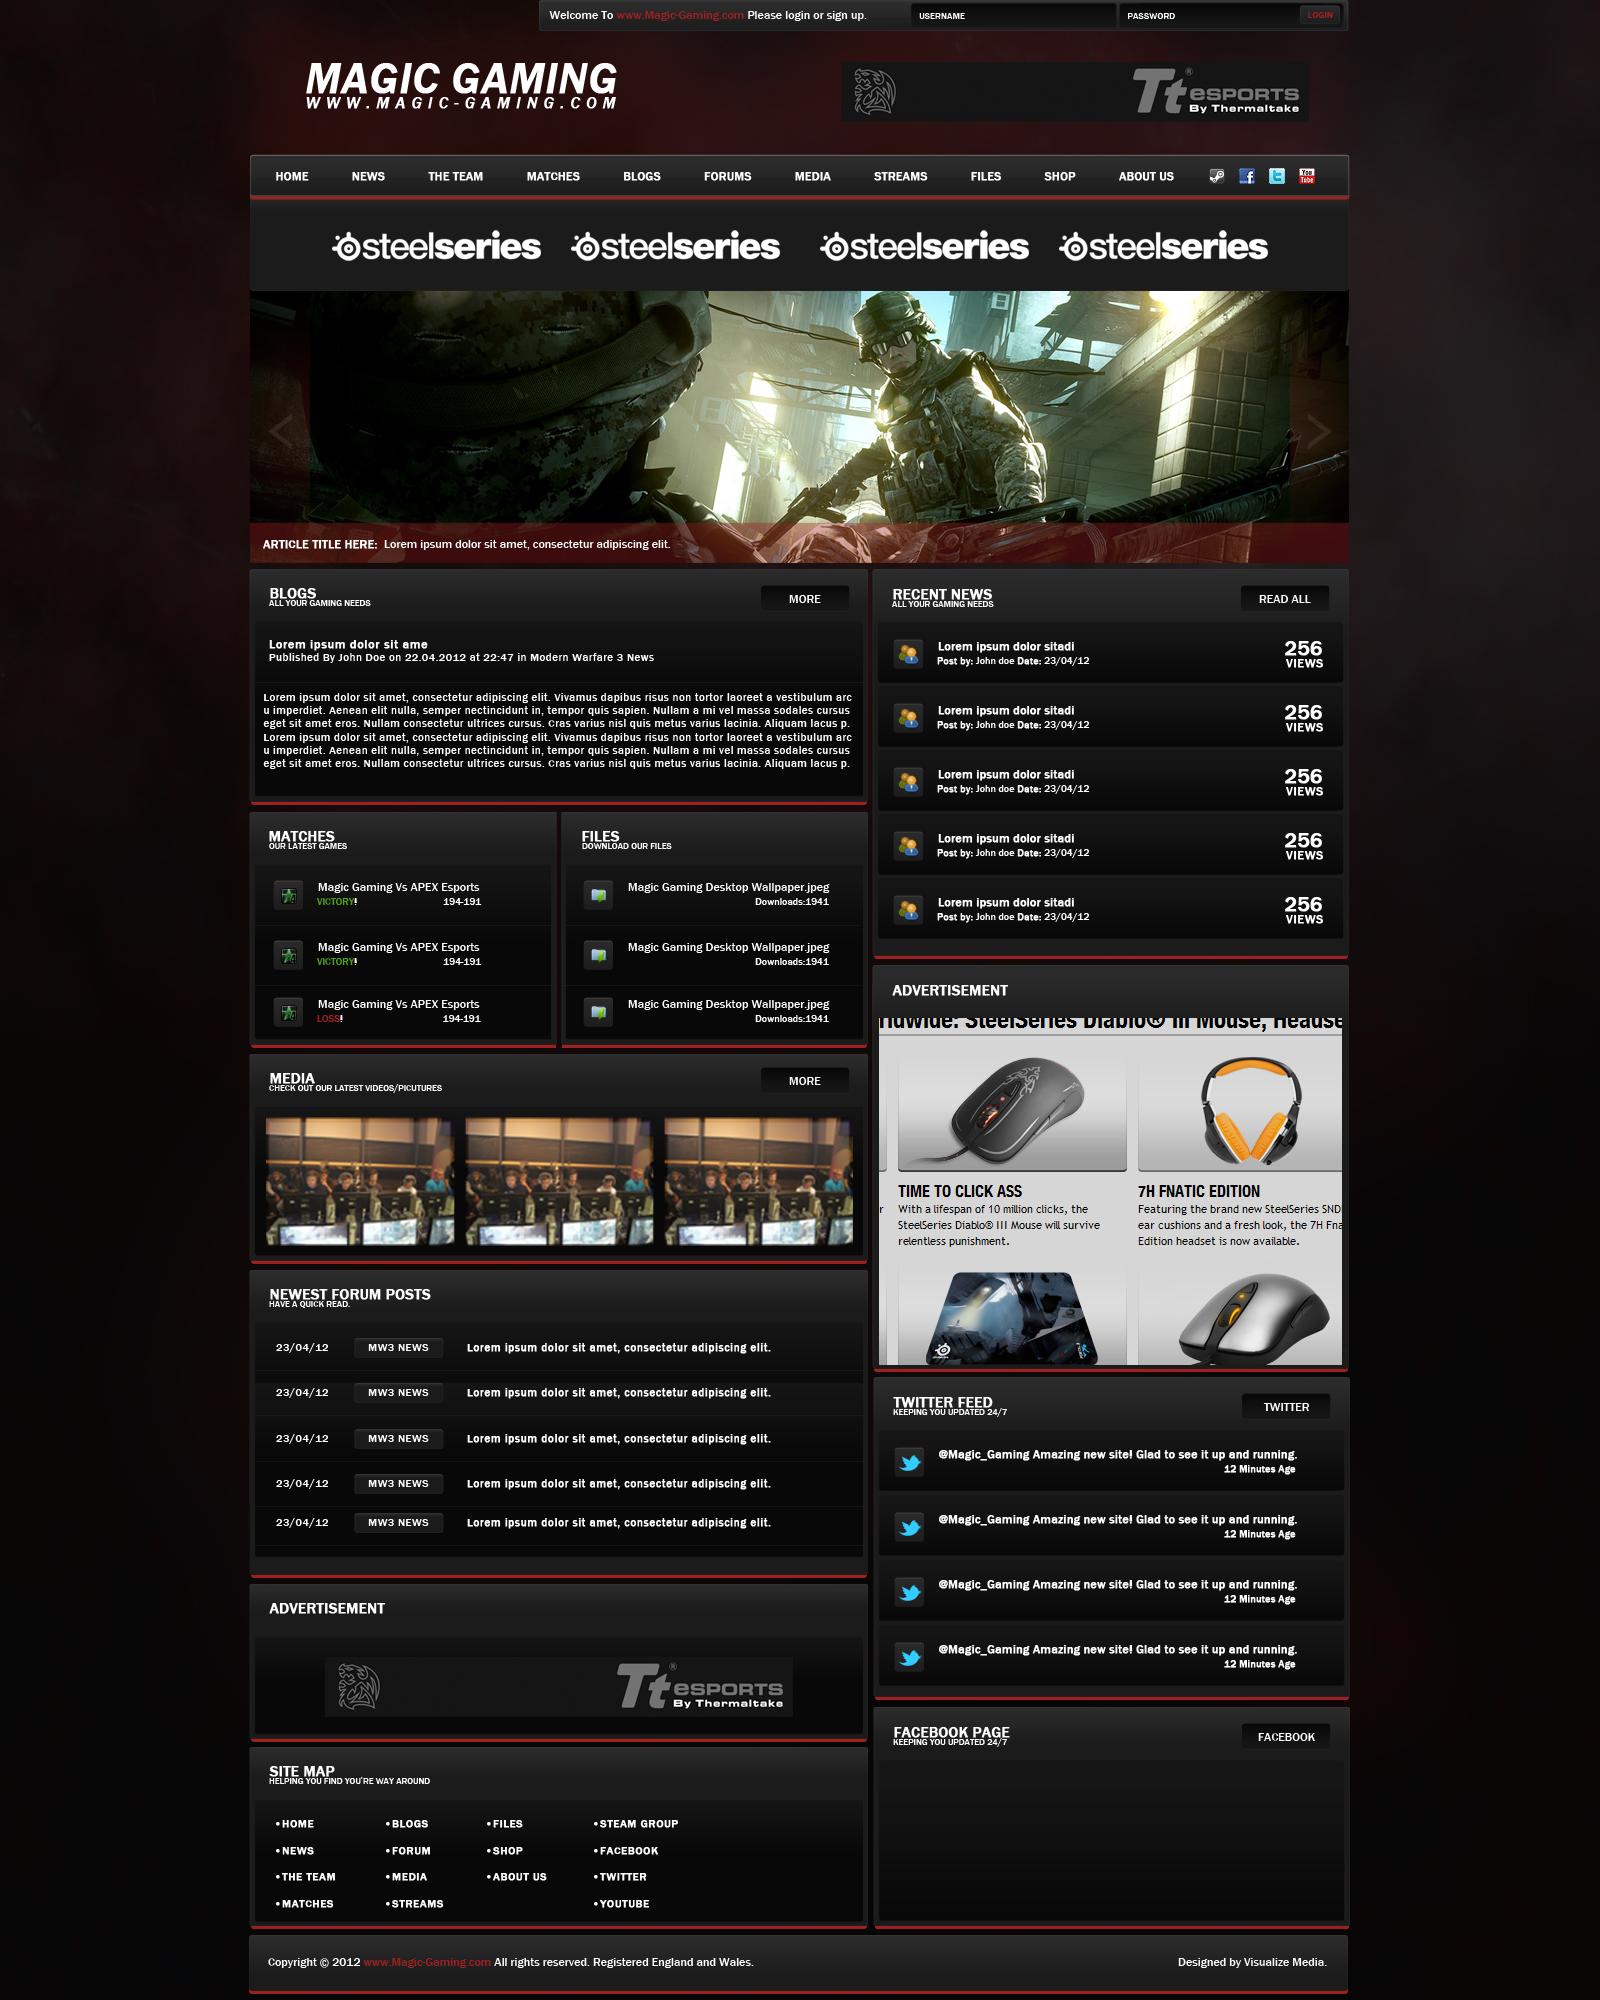 Magic Gaming/Esports Website Design by JAMiddleton on DeviantArt